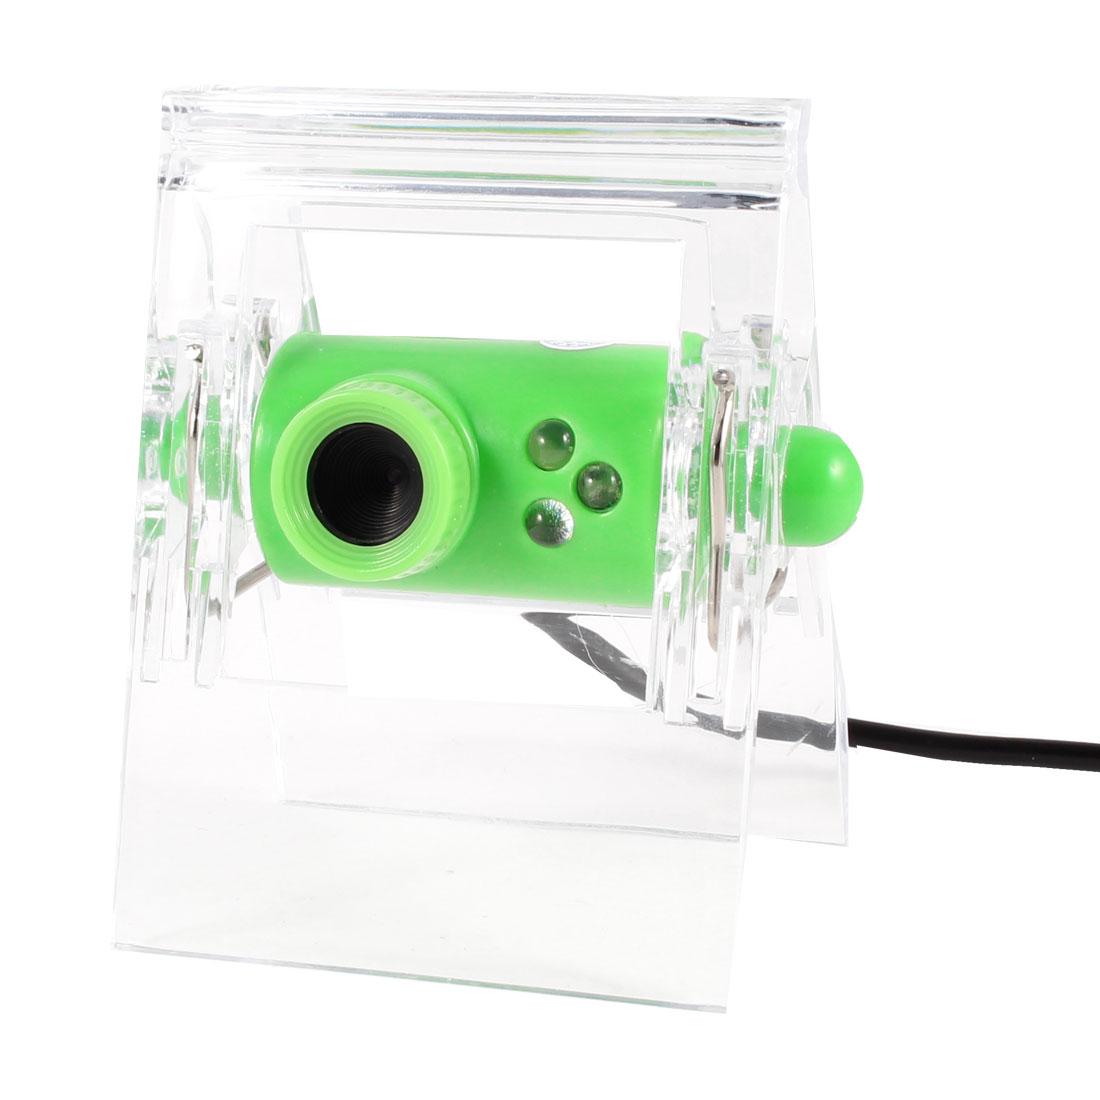 Clip on Design 640x480 3 LED Laptop Camera USB2.0 Webcam Green